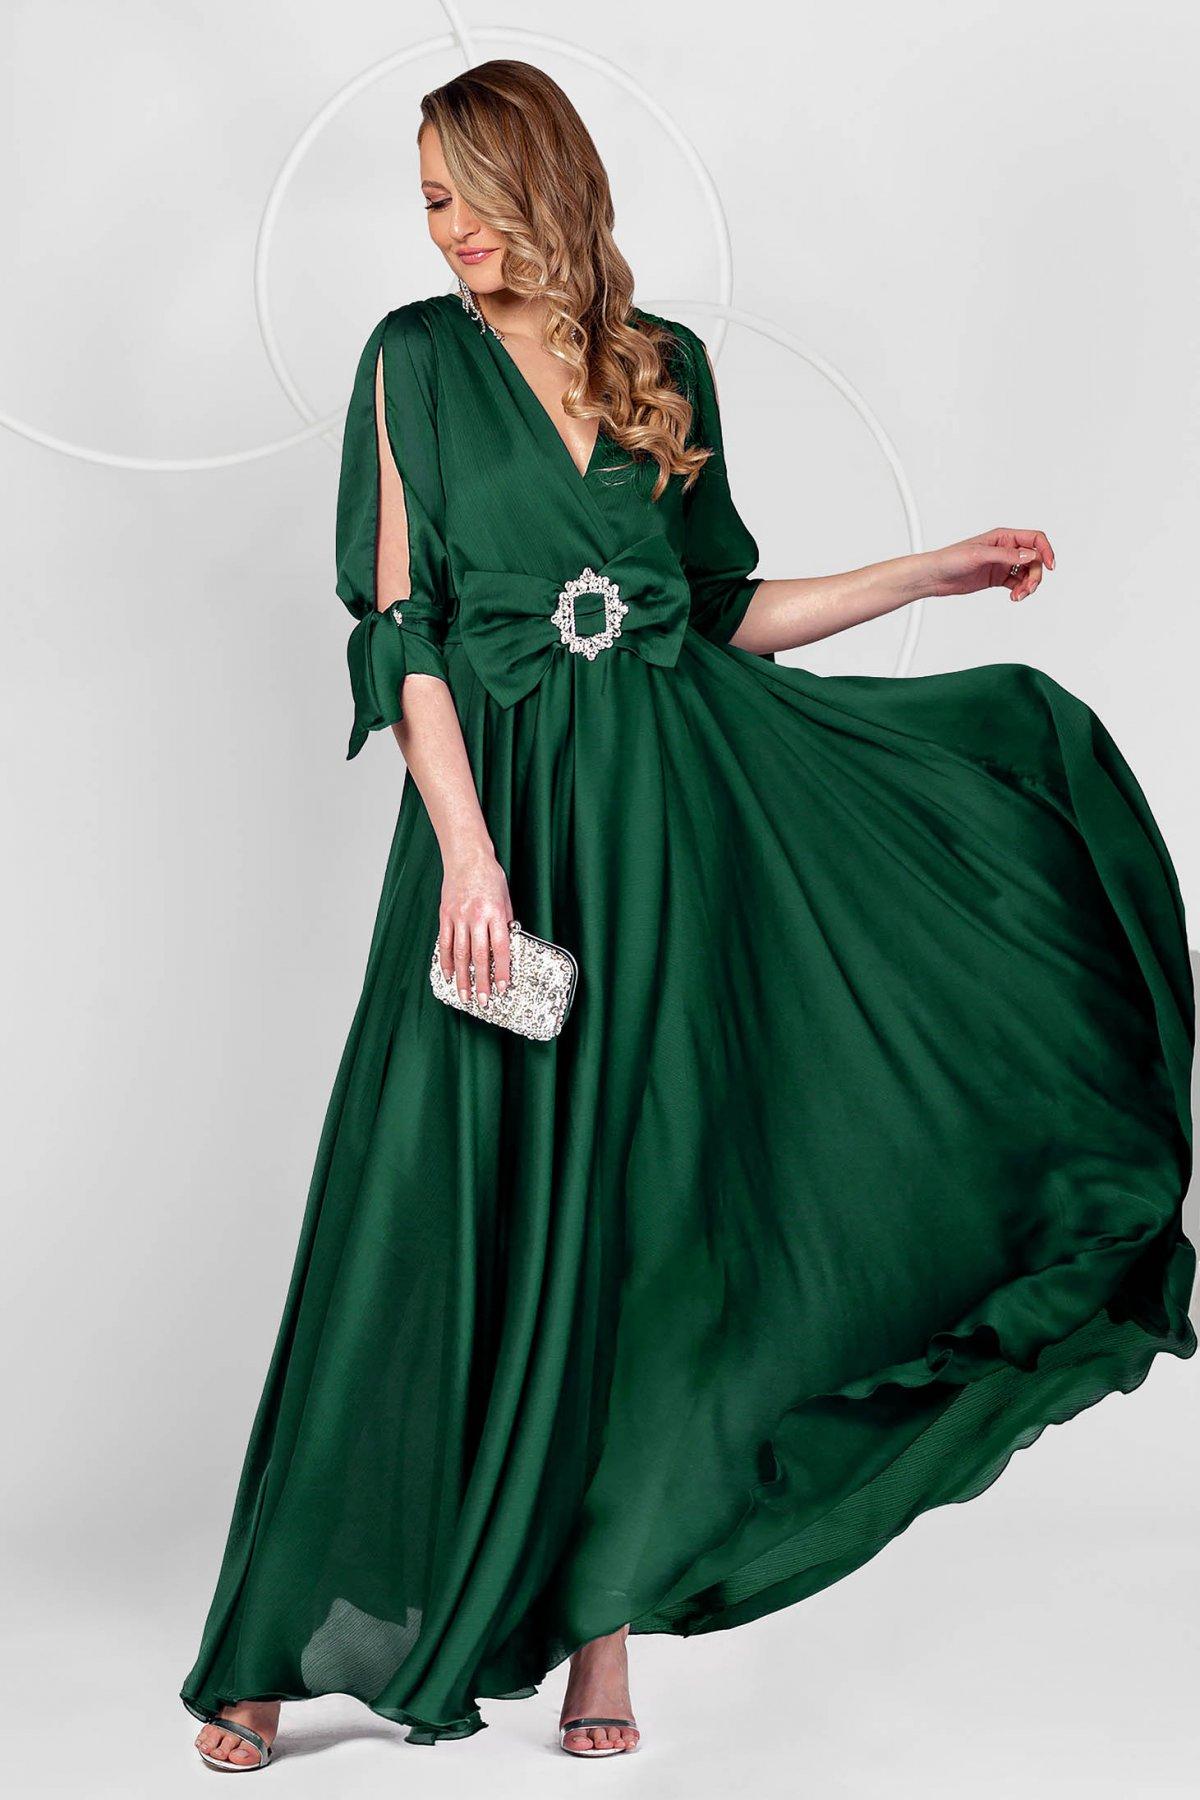 Rochie PrettyGirl verde petrol lunga de ocazie din voal usor satinat in clos cu maneci decupate - medelin.ro